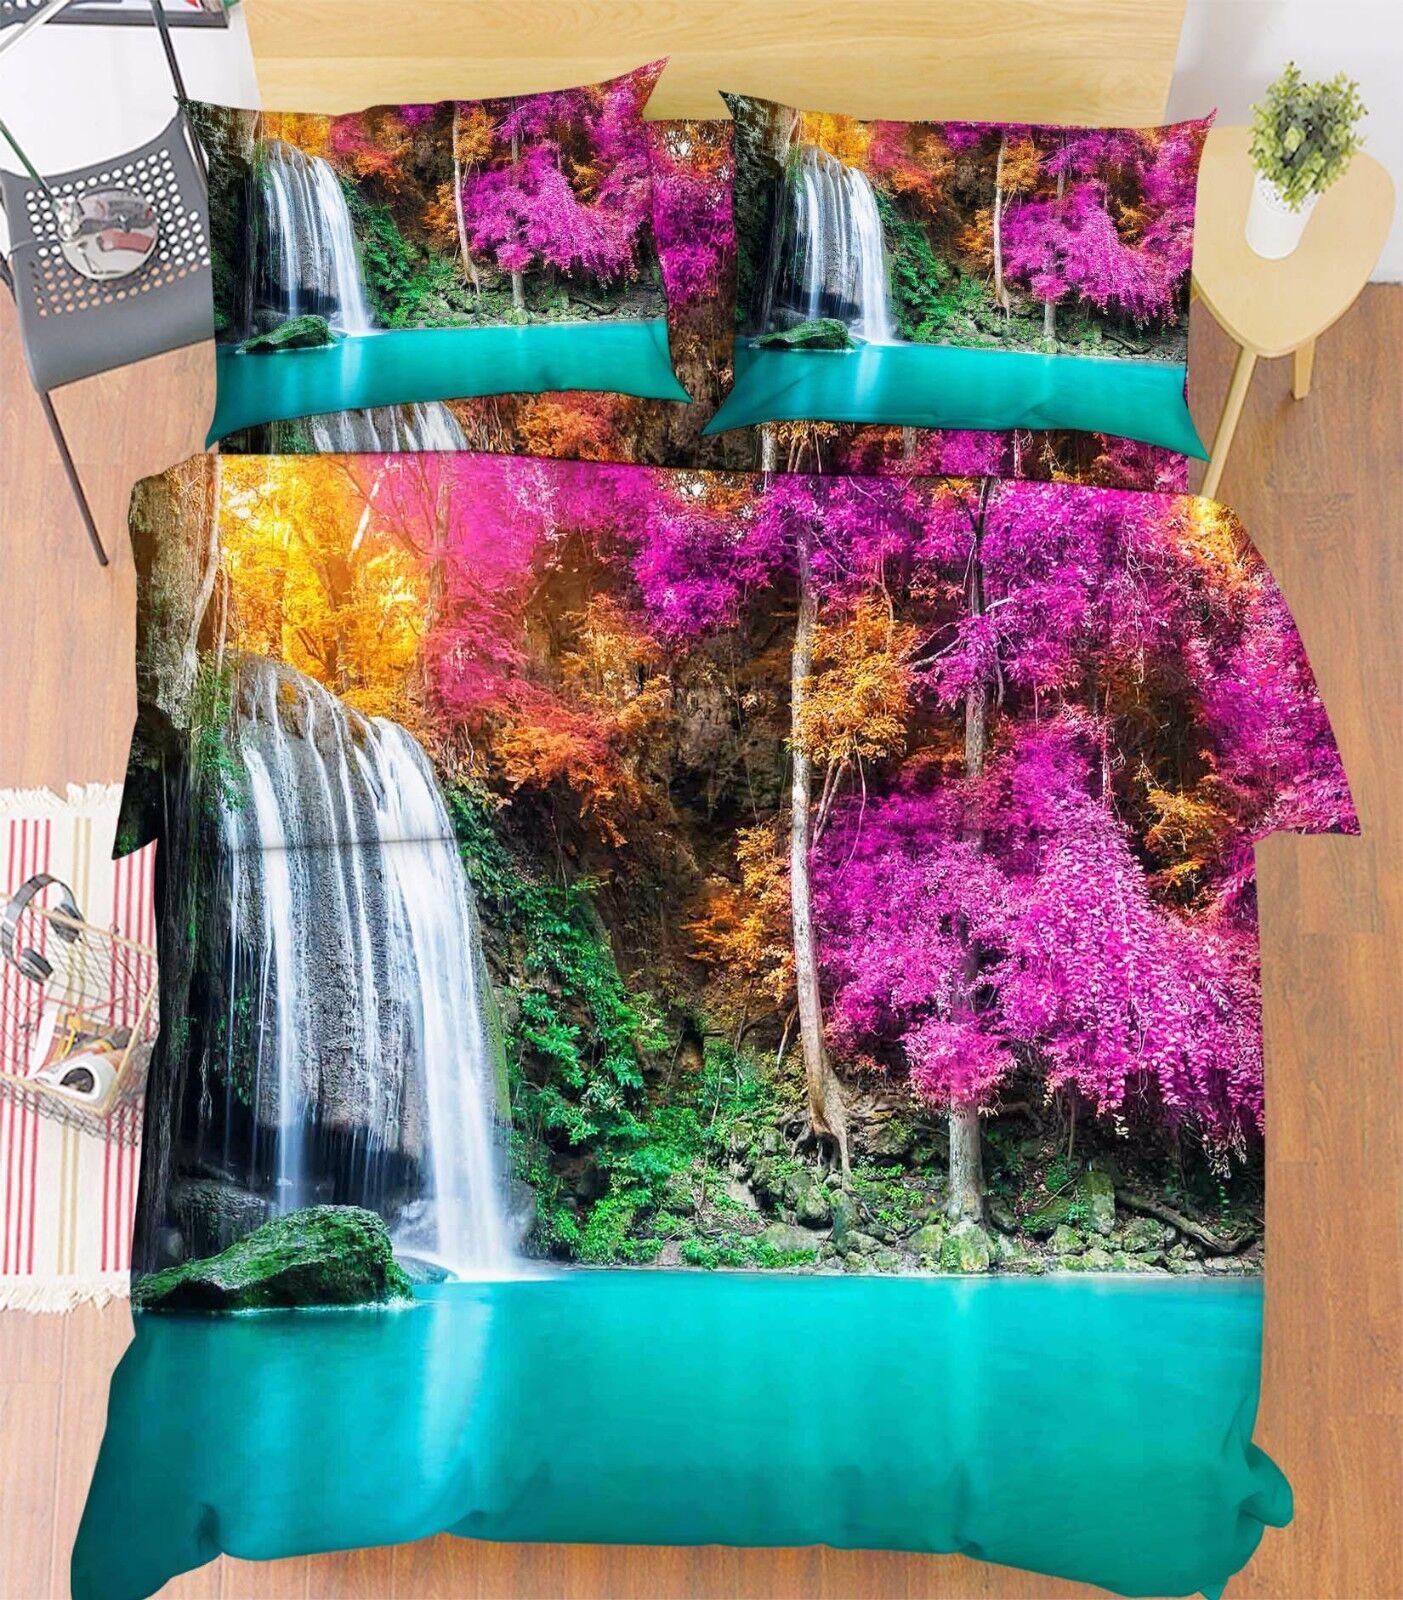 3D Bule Pool Tree 896 Bed Pillowcases Quilt Duvet Cover Set Single Queen UK Kyra